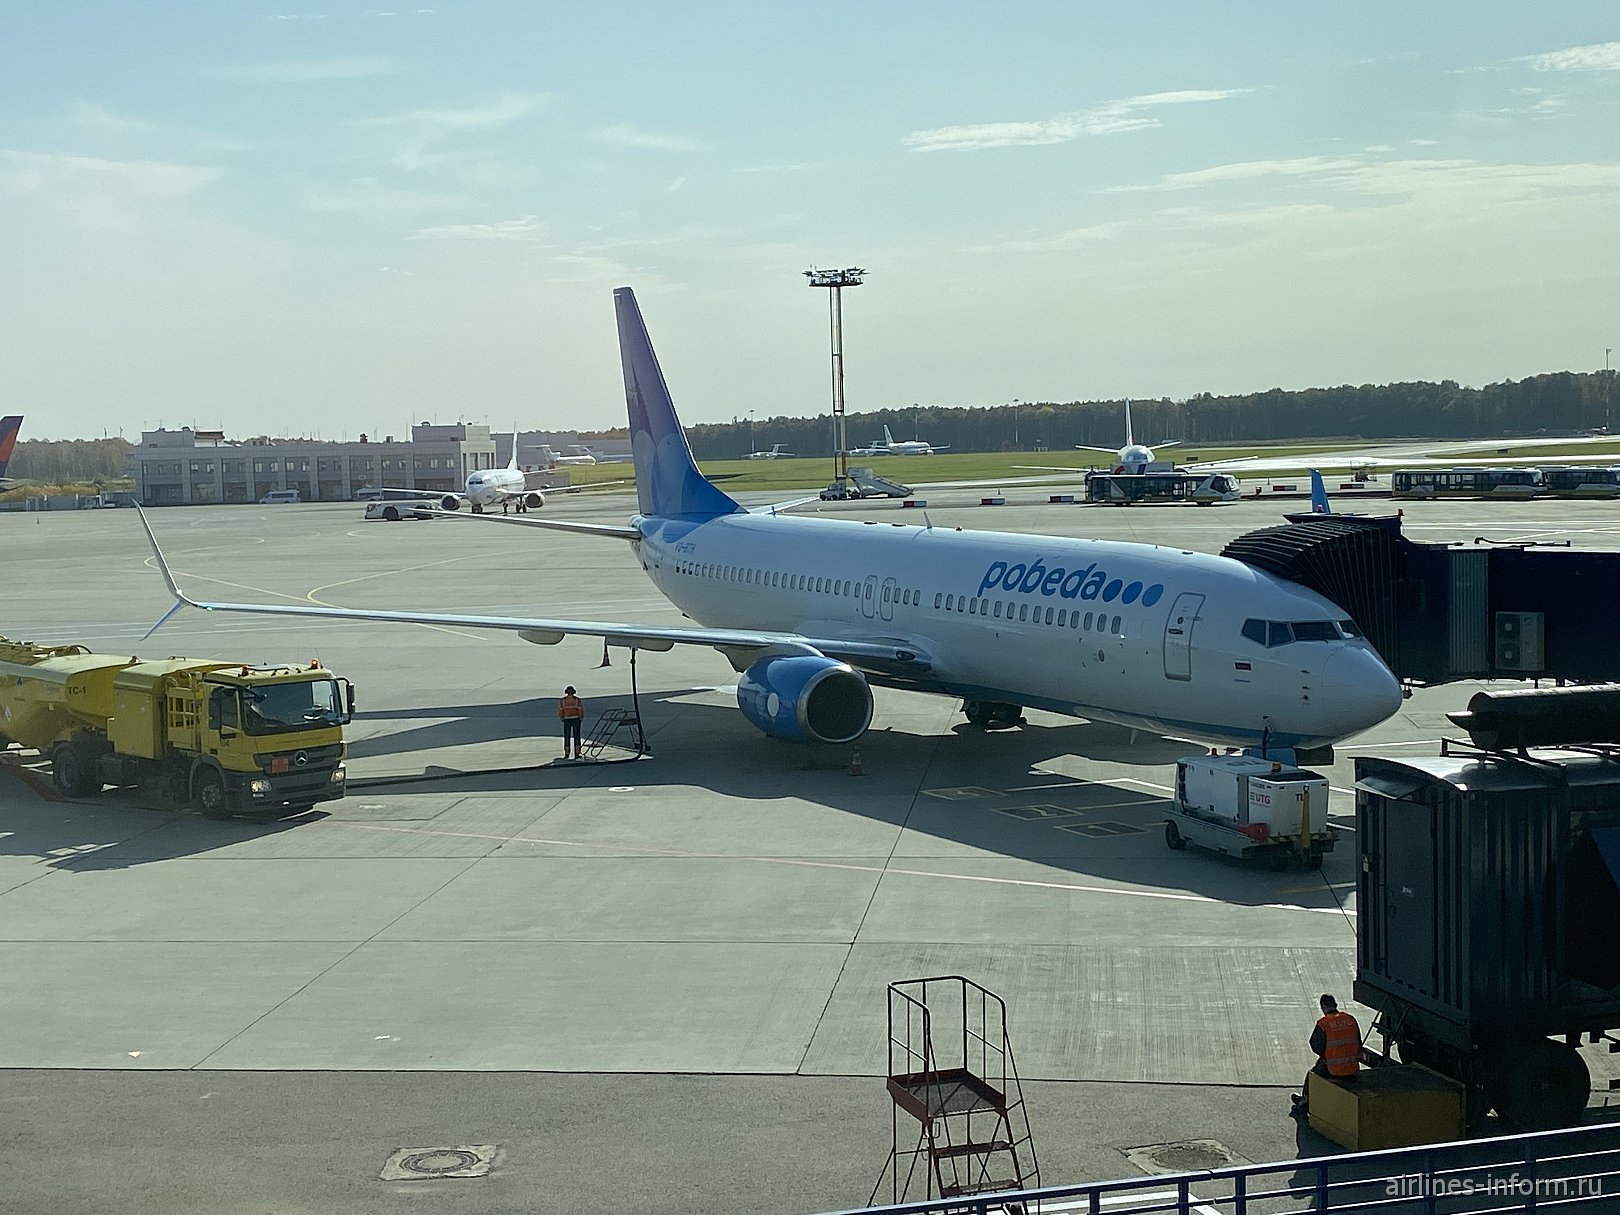 Москва - Санкт-Петербург с Победой на Boeing 737-800 VP-BQG